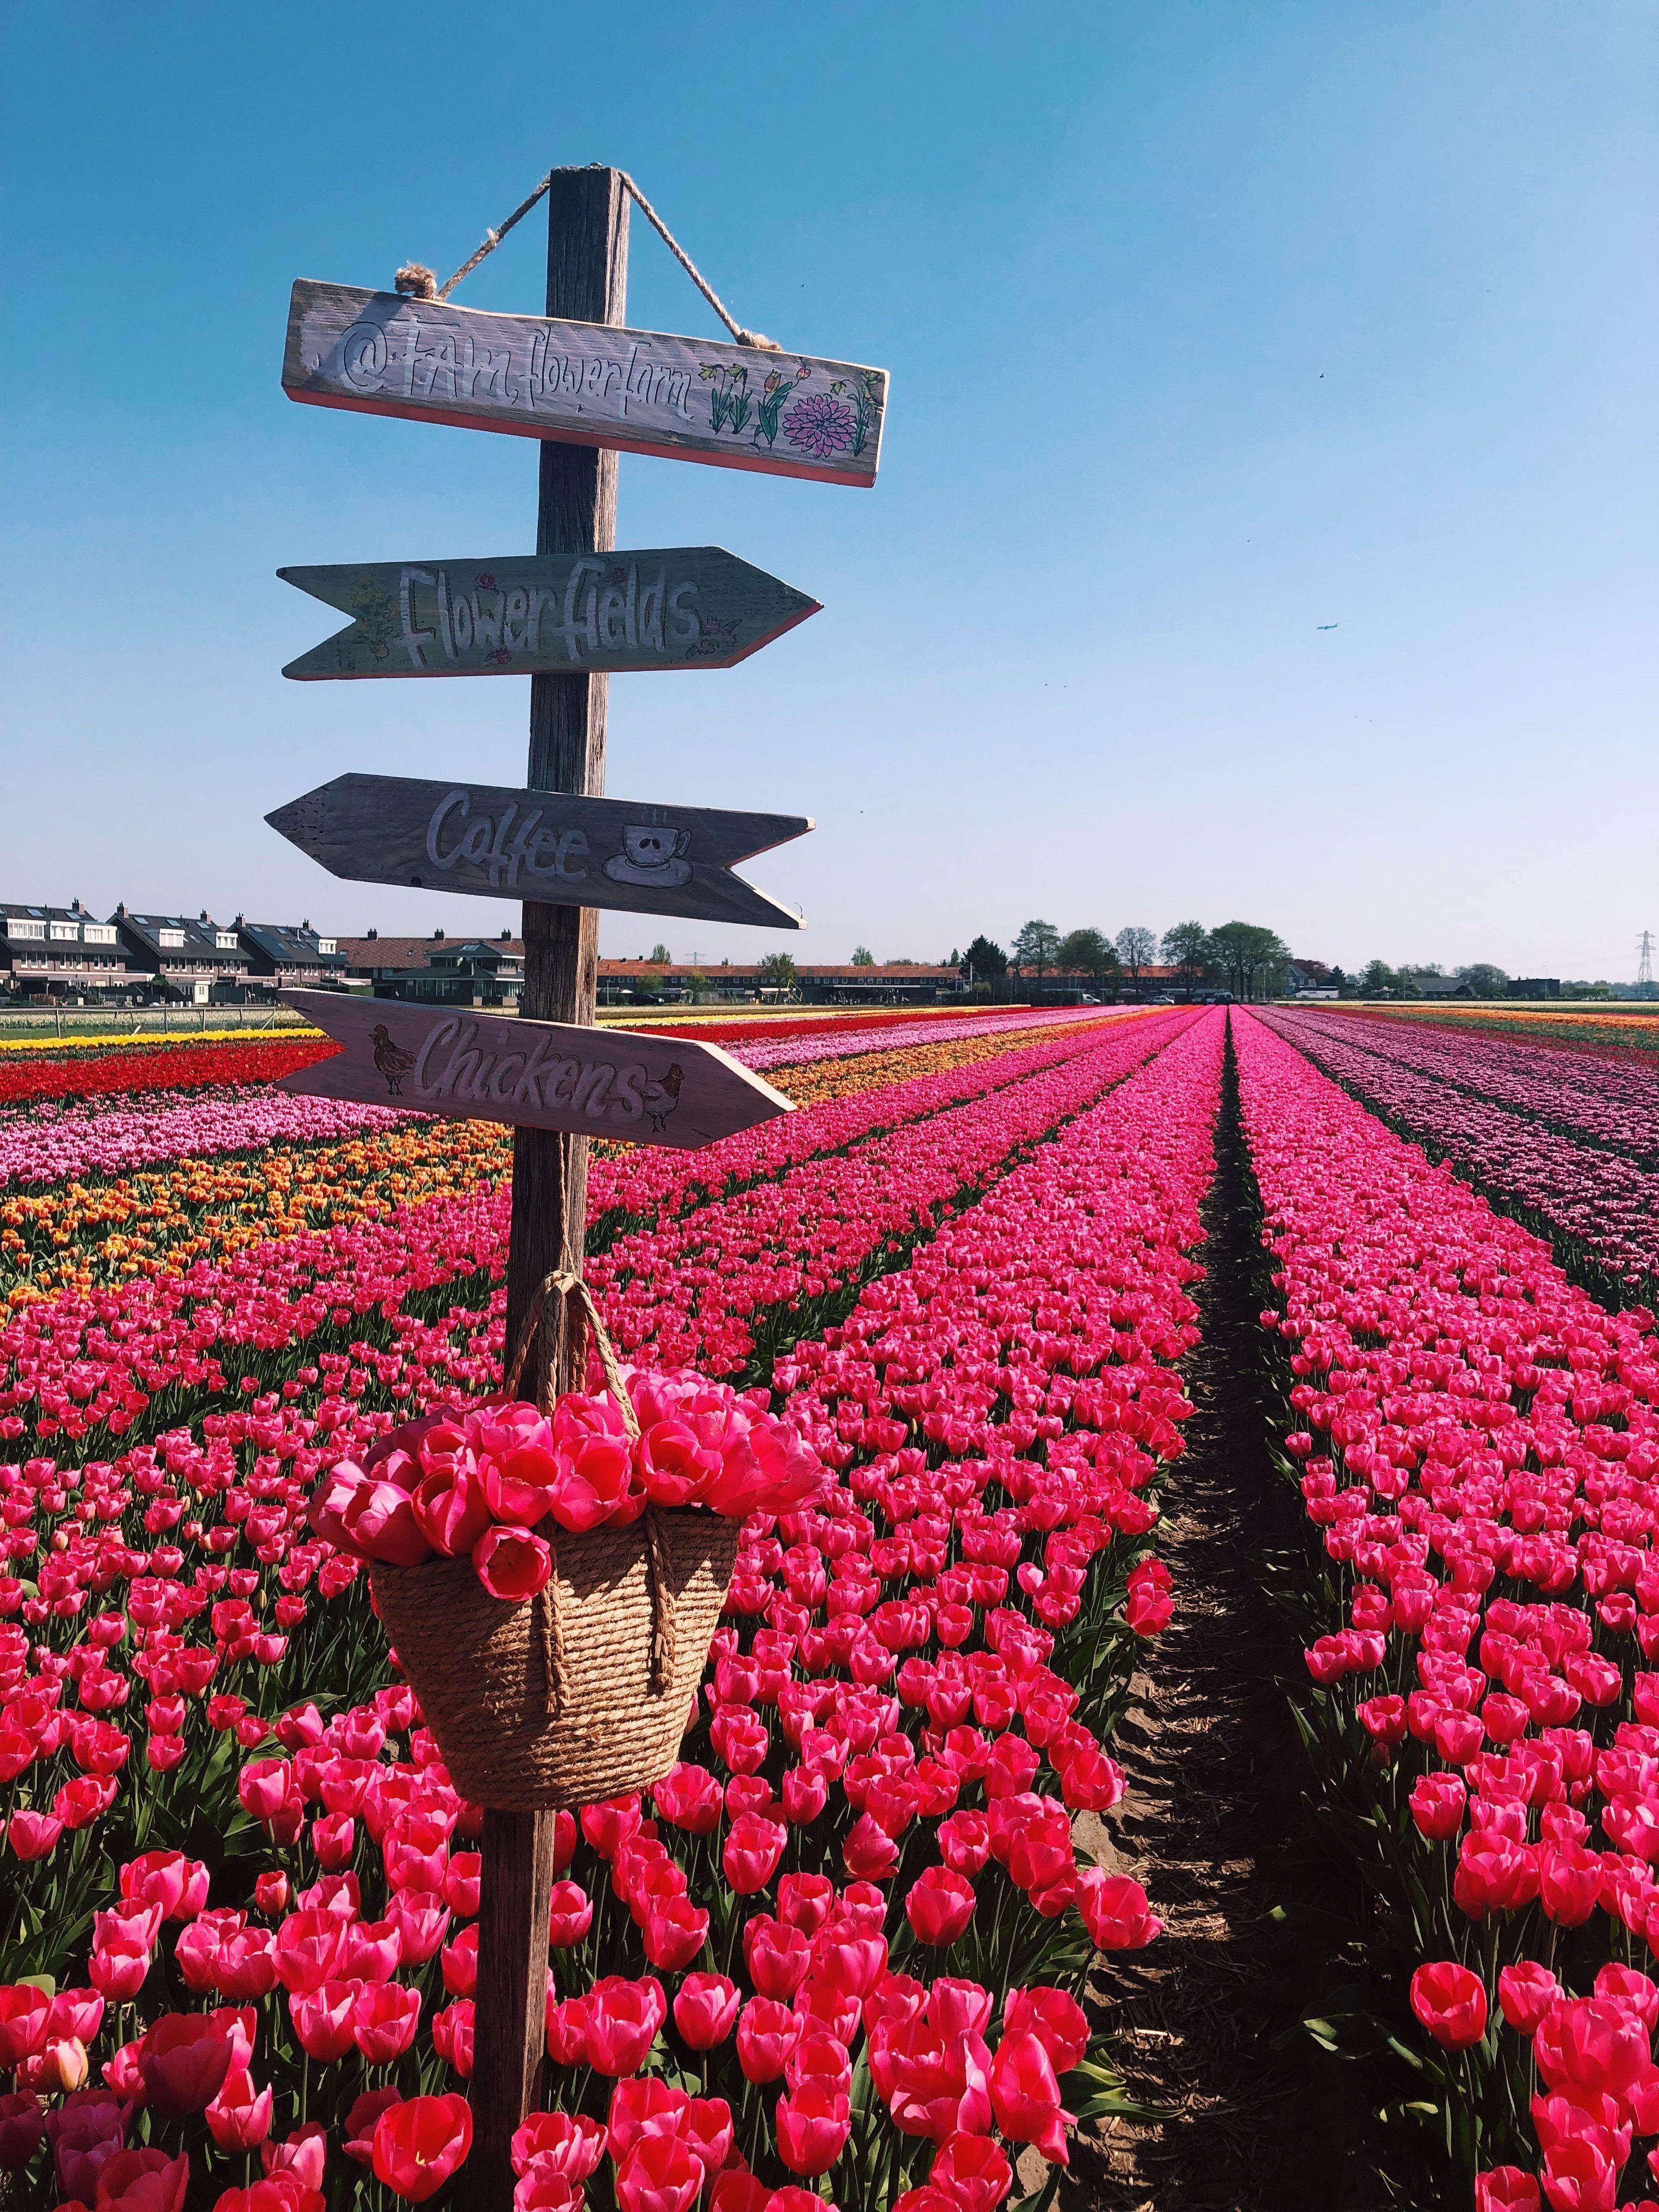 Tulip Fields Lisse Netherlands Private Tour At Fam Flower Farm Travel Wanderlust Tulipfields Flowerfields H Flower Farm Beautiful Gardens Tulip Fields